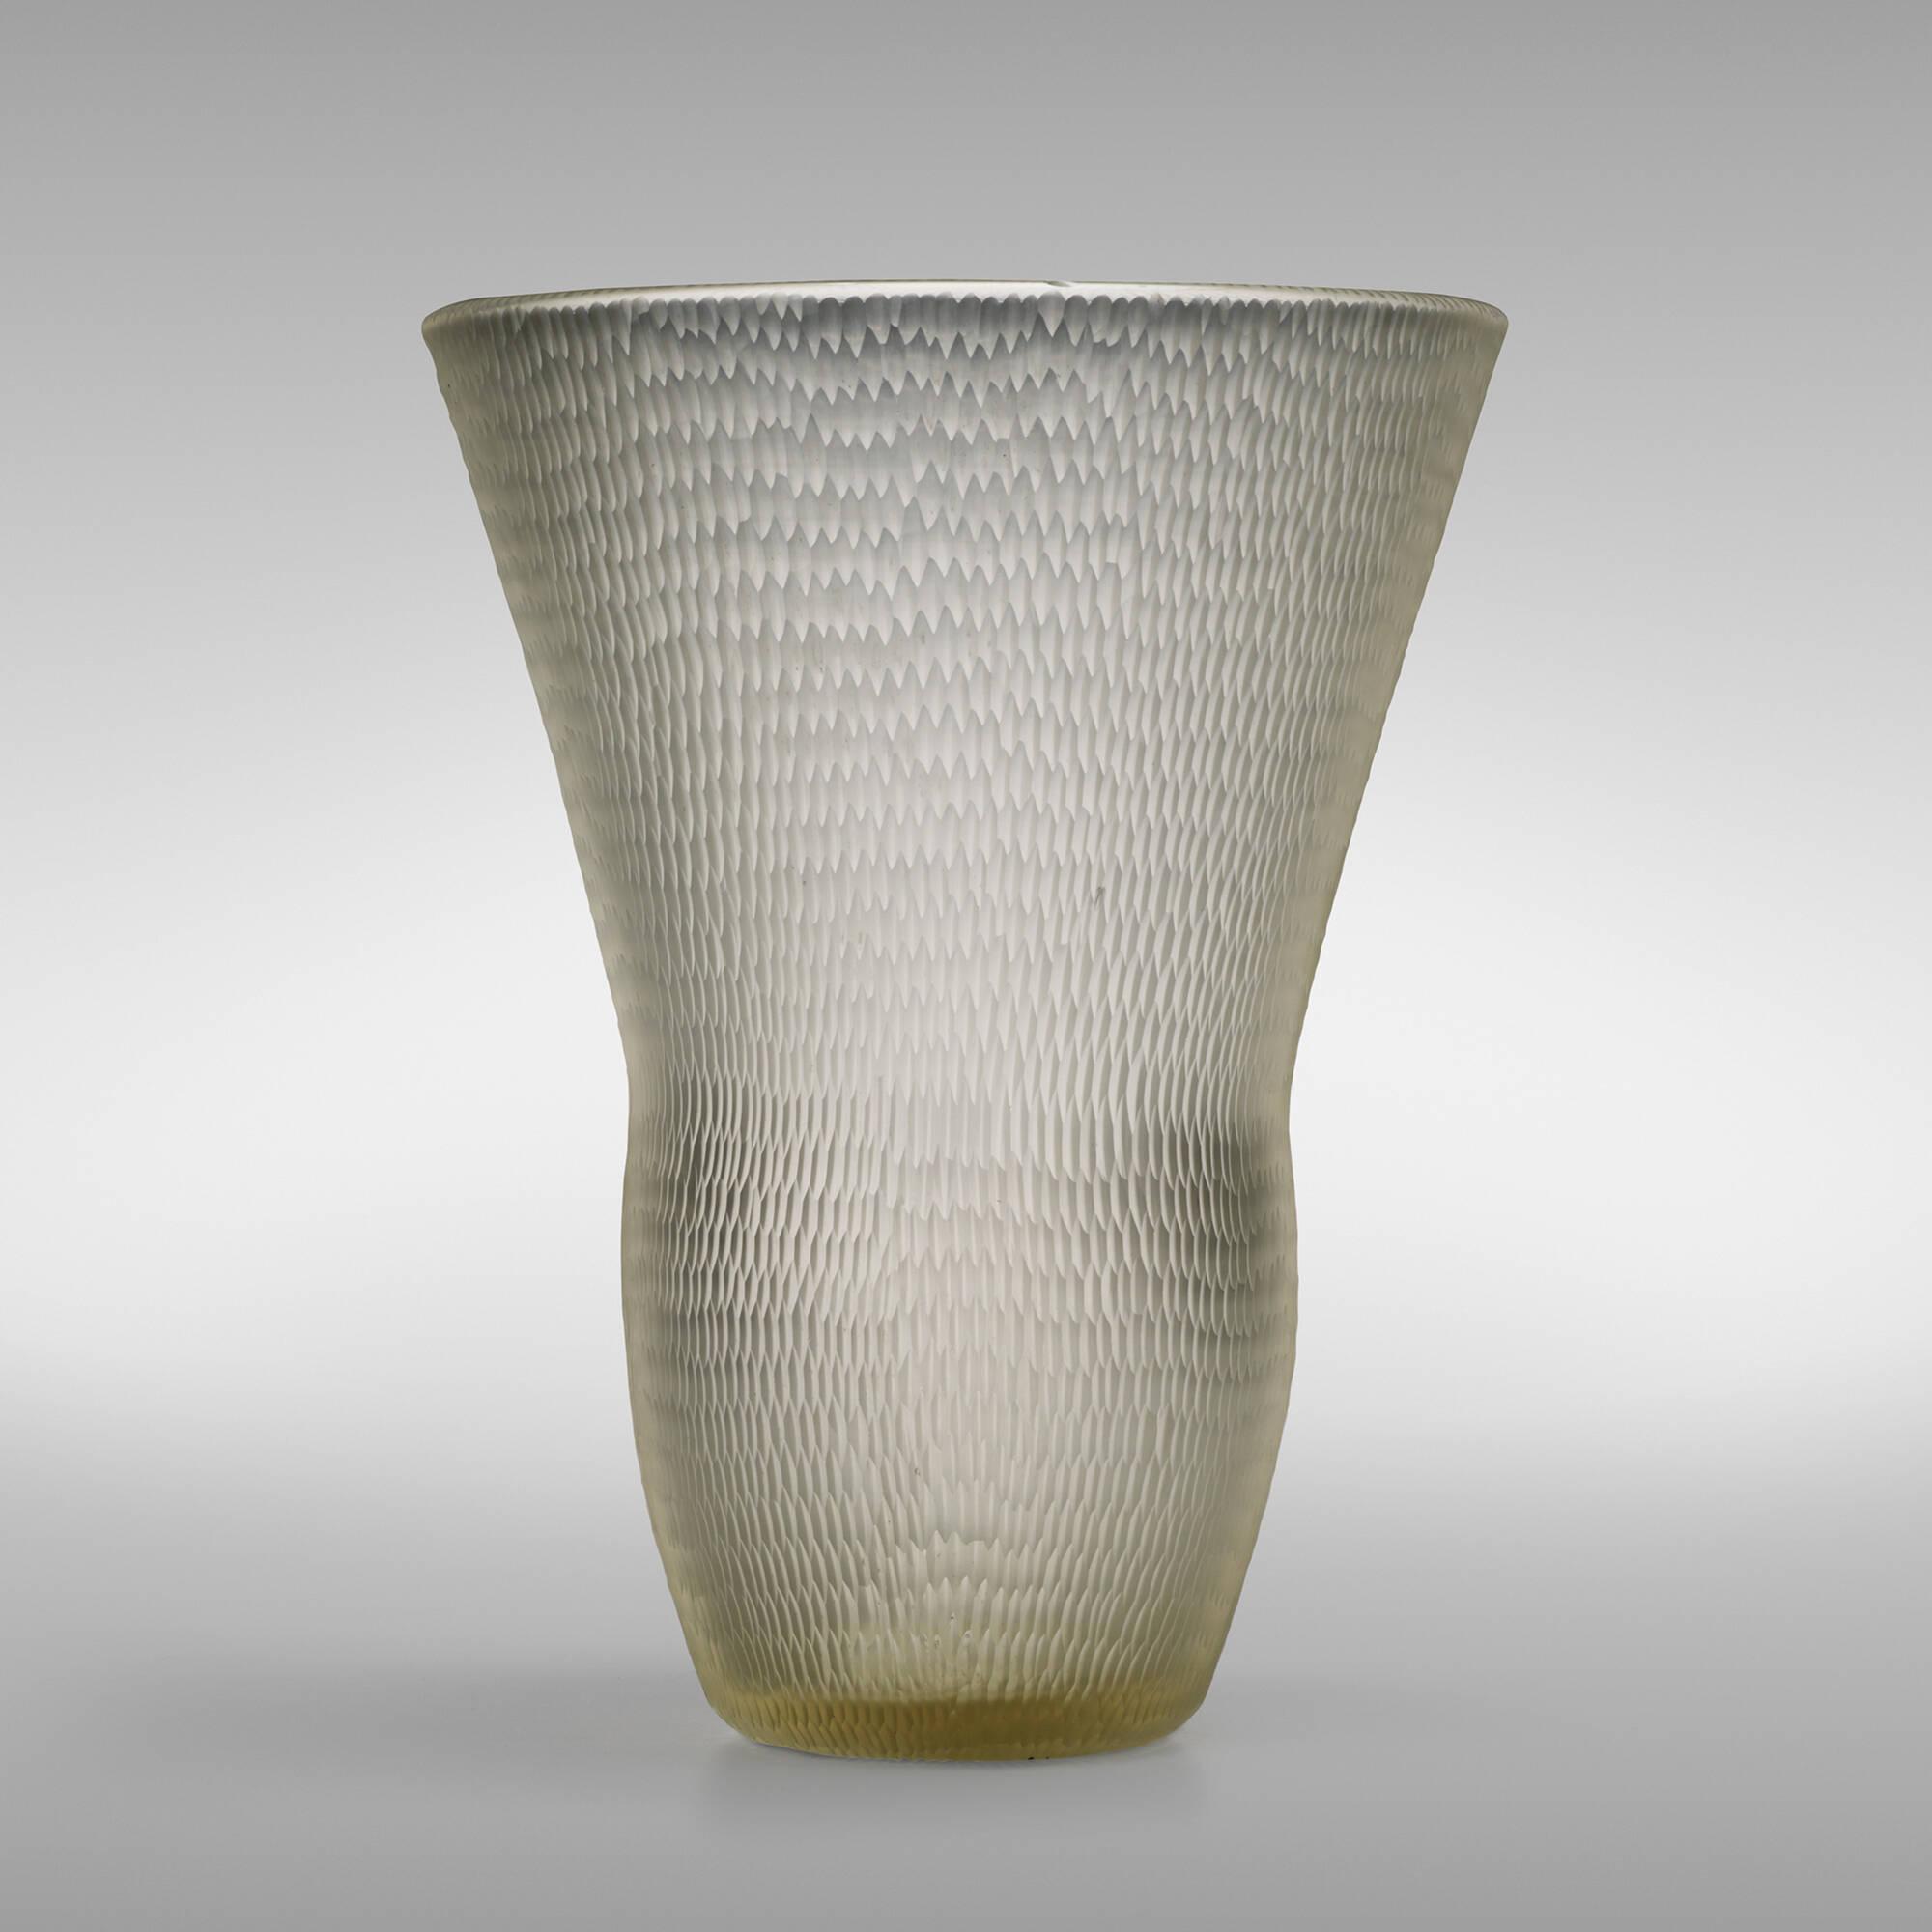 144 carlo scarpa battuto vase model 3908 important italian 144 carlo scarpa battuto vase model 3908 1 of 3 floridaeventfo Image collections